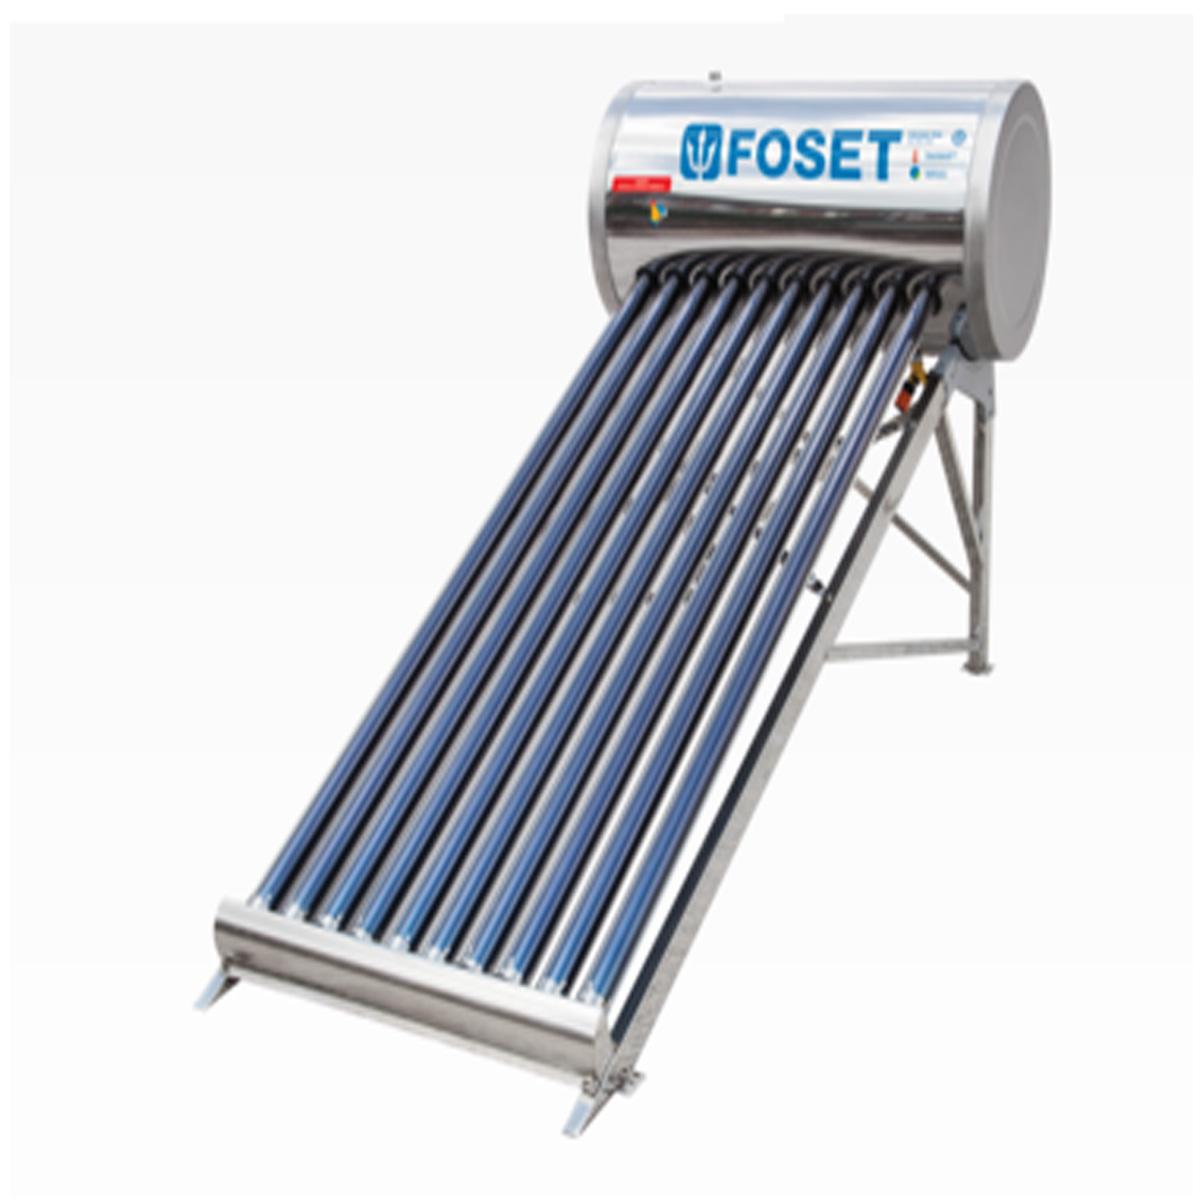 Calentador solar 100 litros foset 45270 materiales el - Calentadores de agua baratos ...